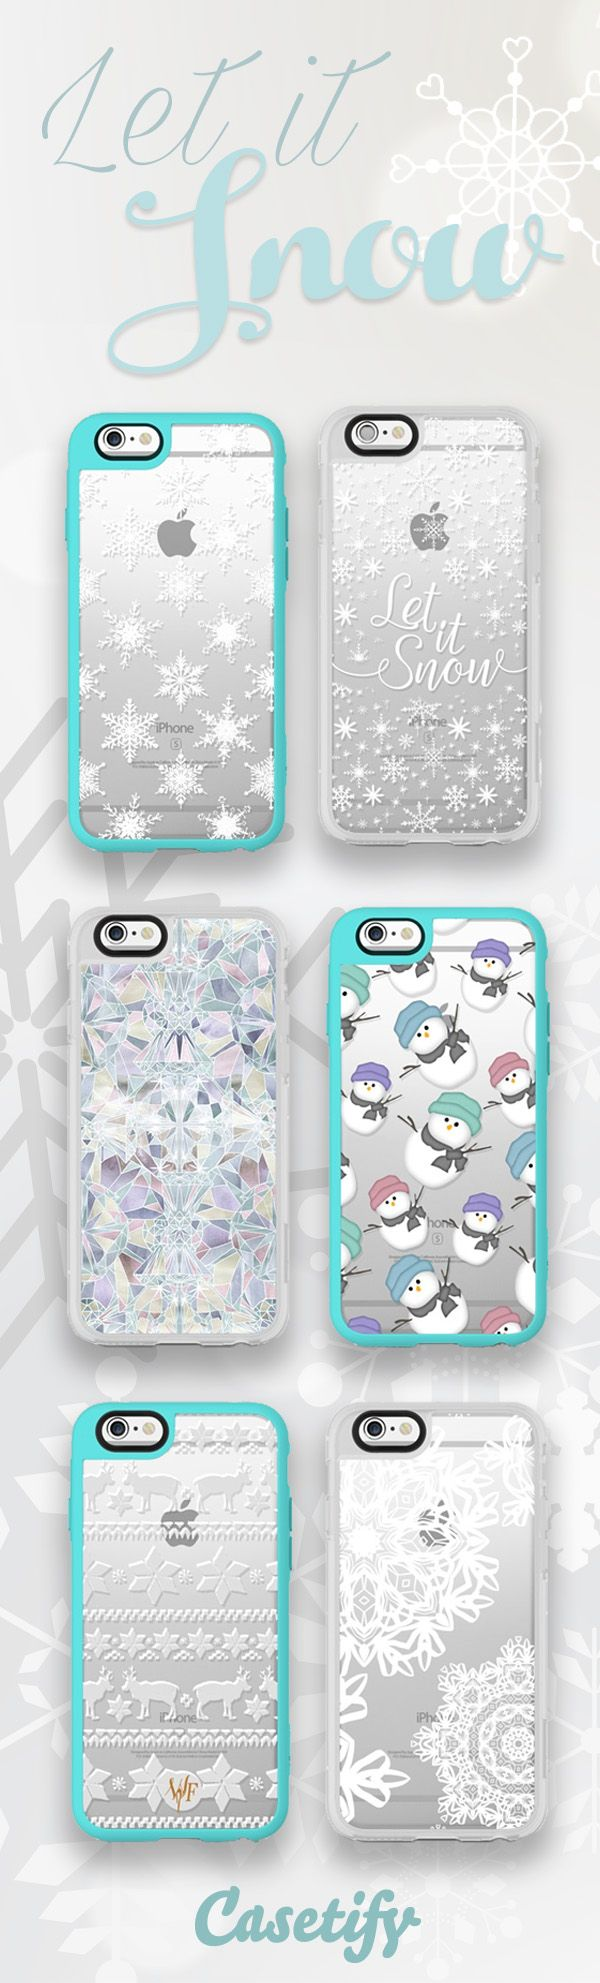 mobile case designs 3